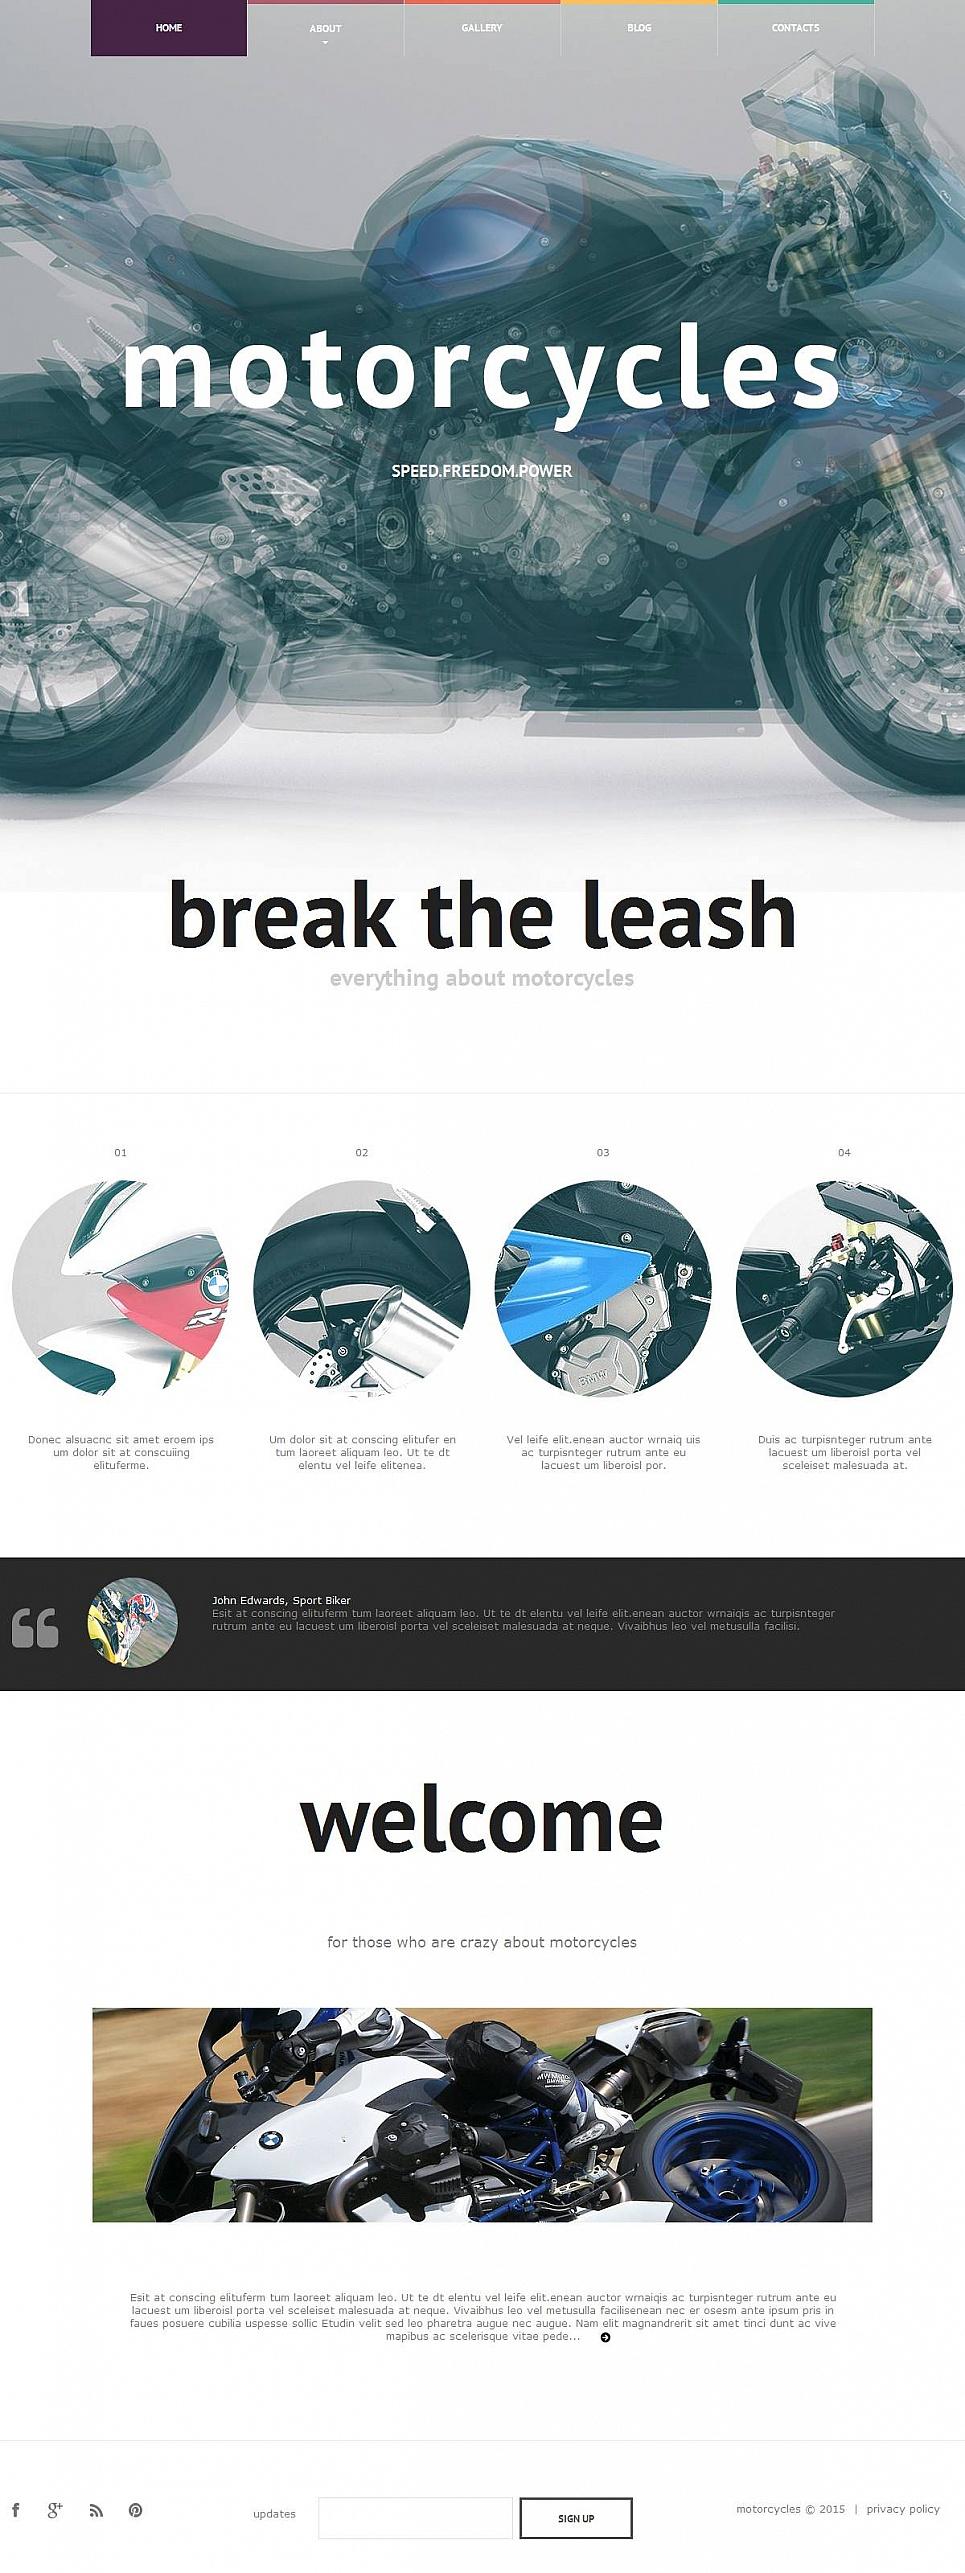 Motorbikes Website Template - image